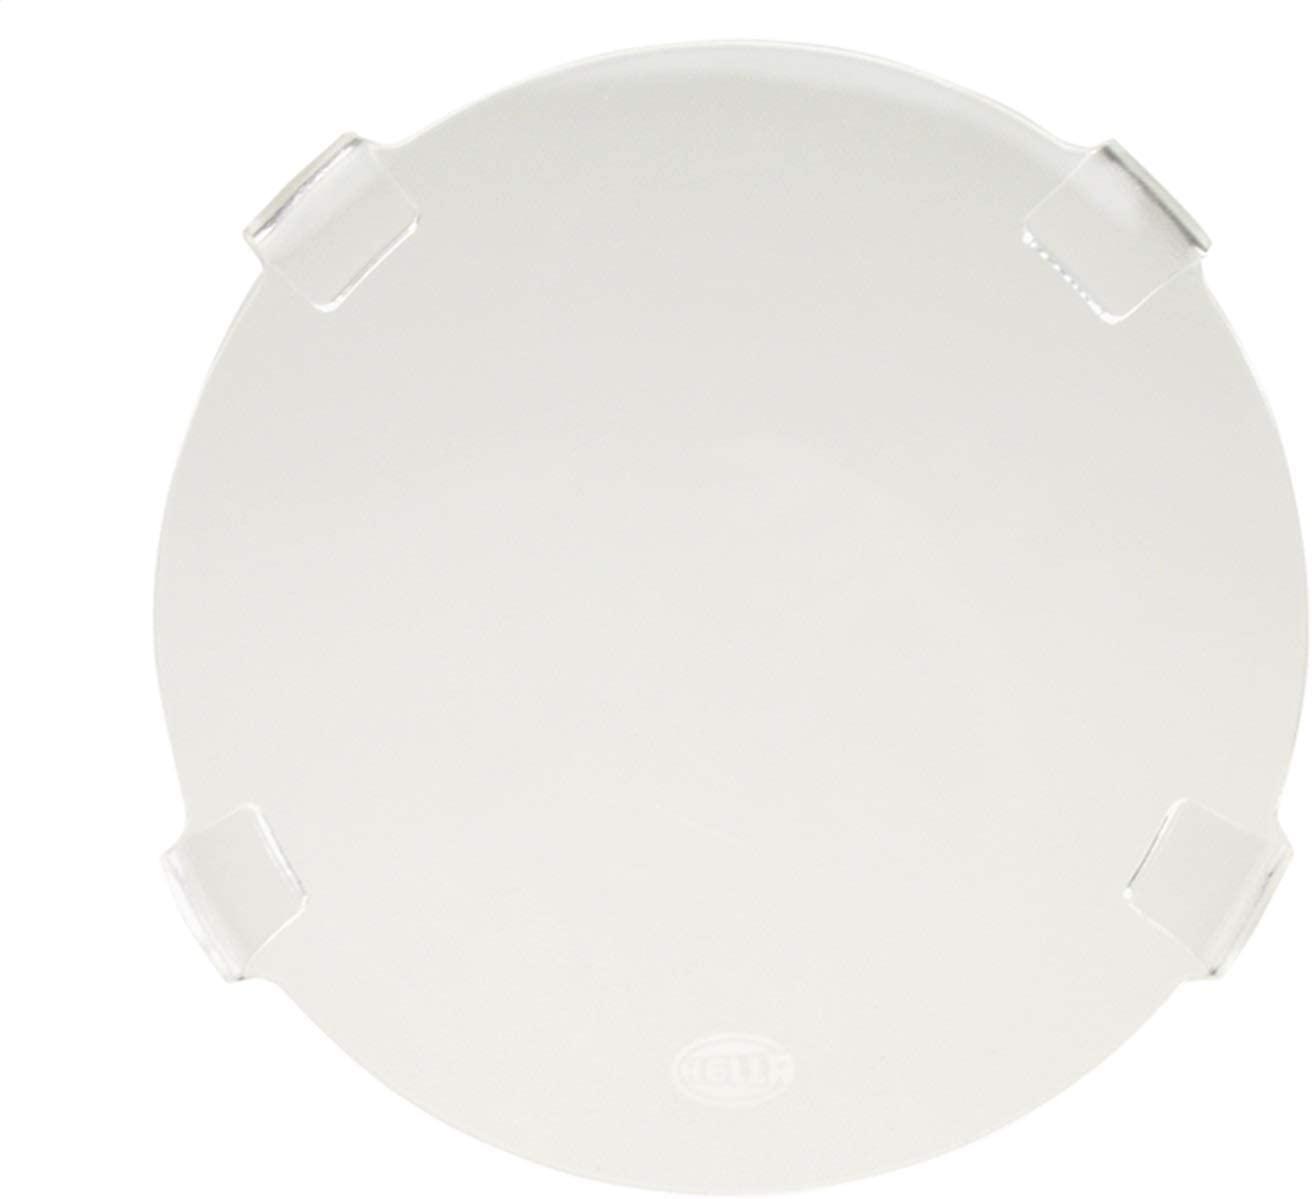 HELLA H87988221 Clear Stone Shield for HELLA Rallye 4000 Compact Series Lamp